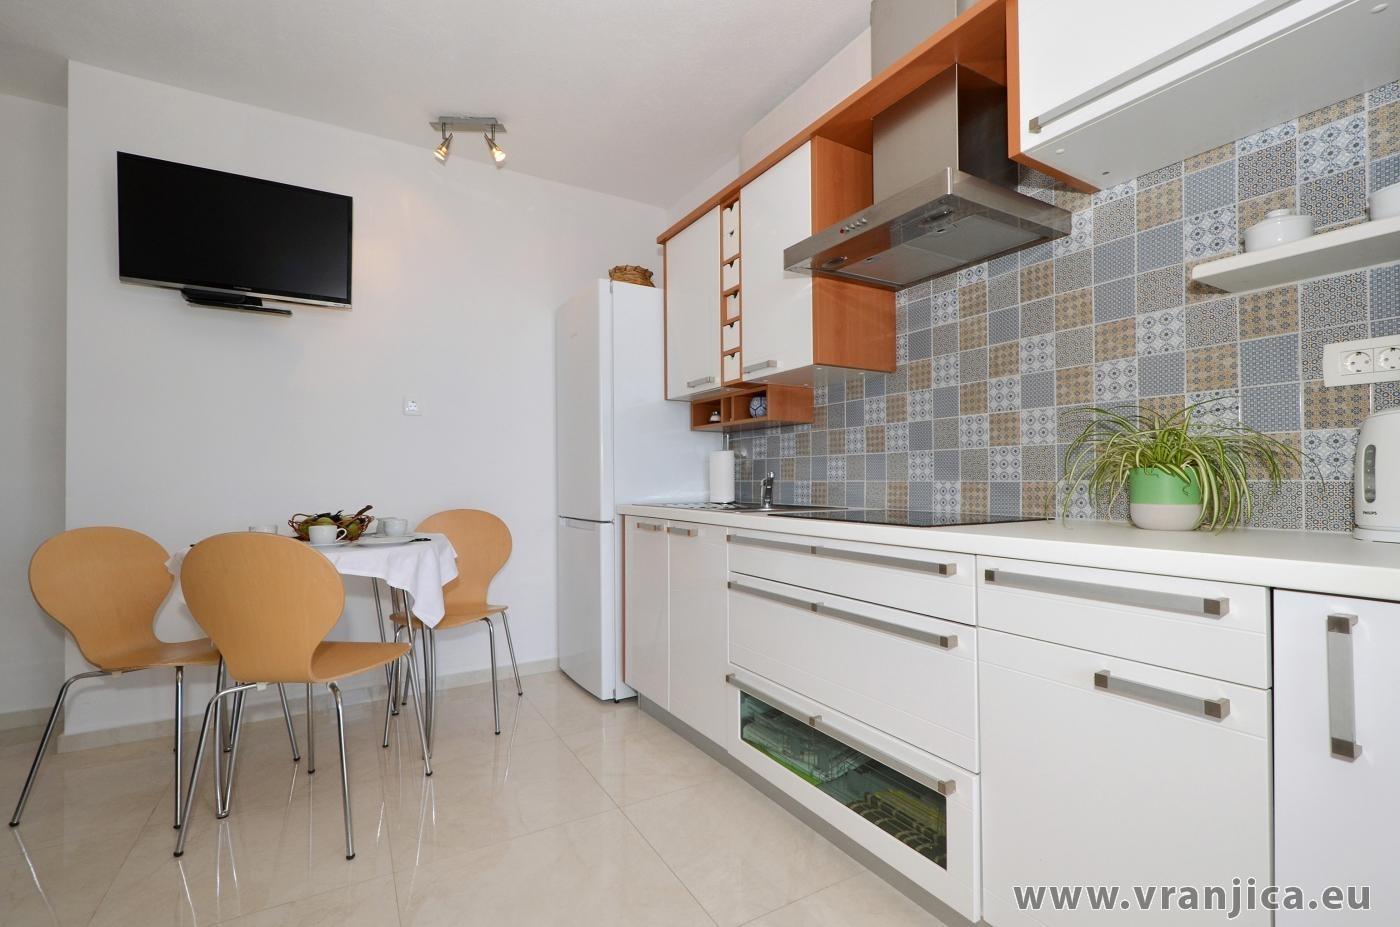 https://www.vranjica.eu/pokoje/apartman-inge-ap2-4-1-1572992290L.jpg